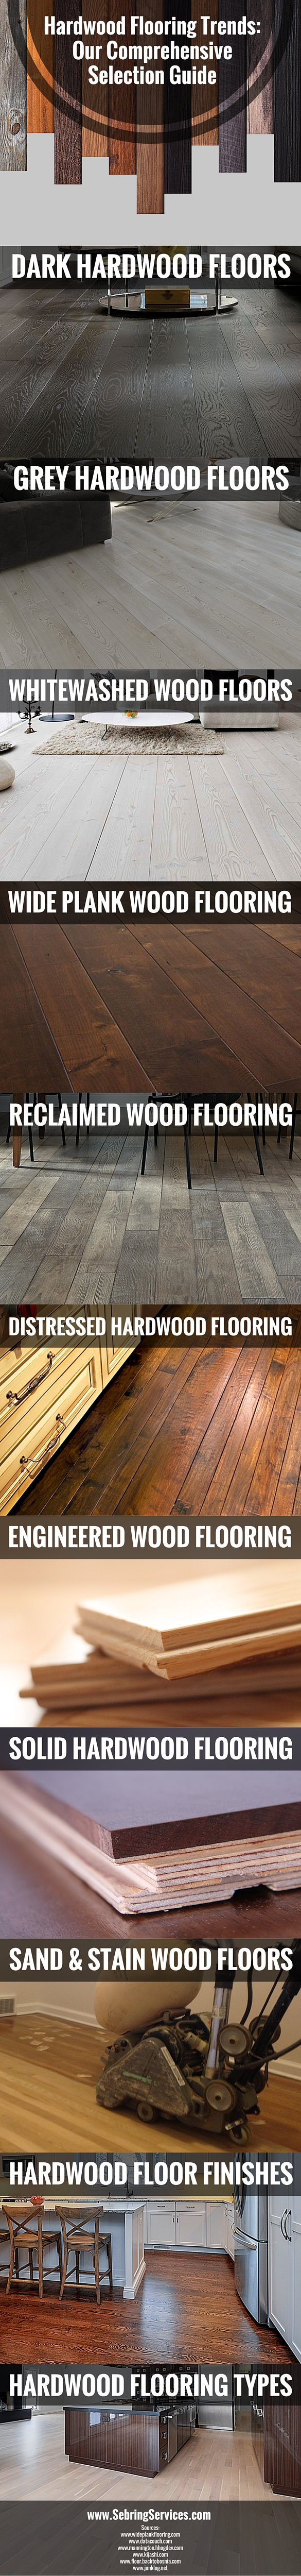 Hardwood Flooring Trends Our Comprehensive Selection Guide - Sebring Services